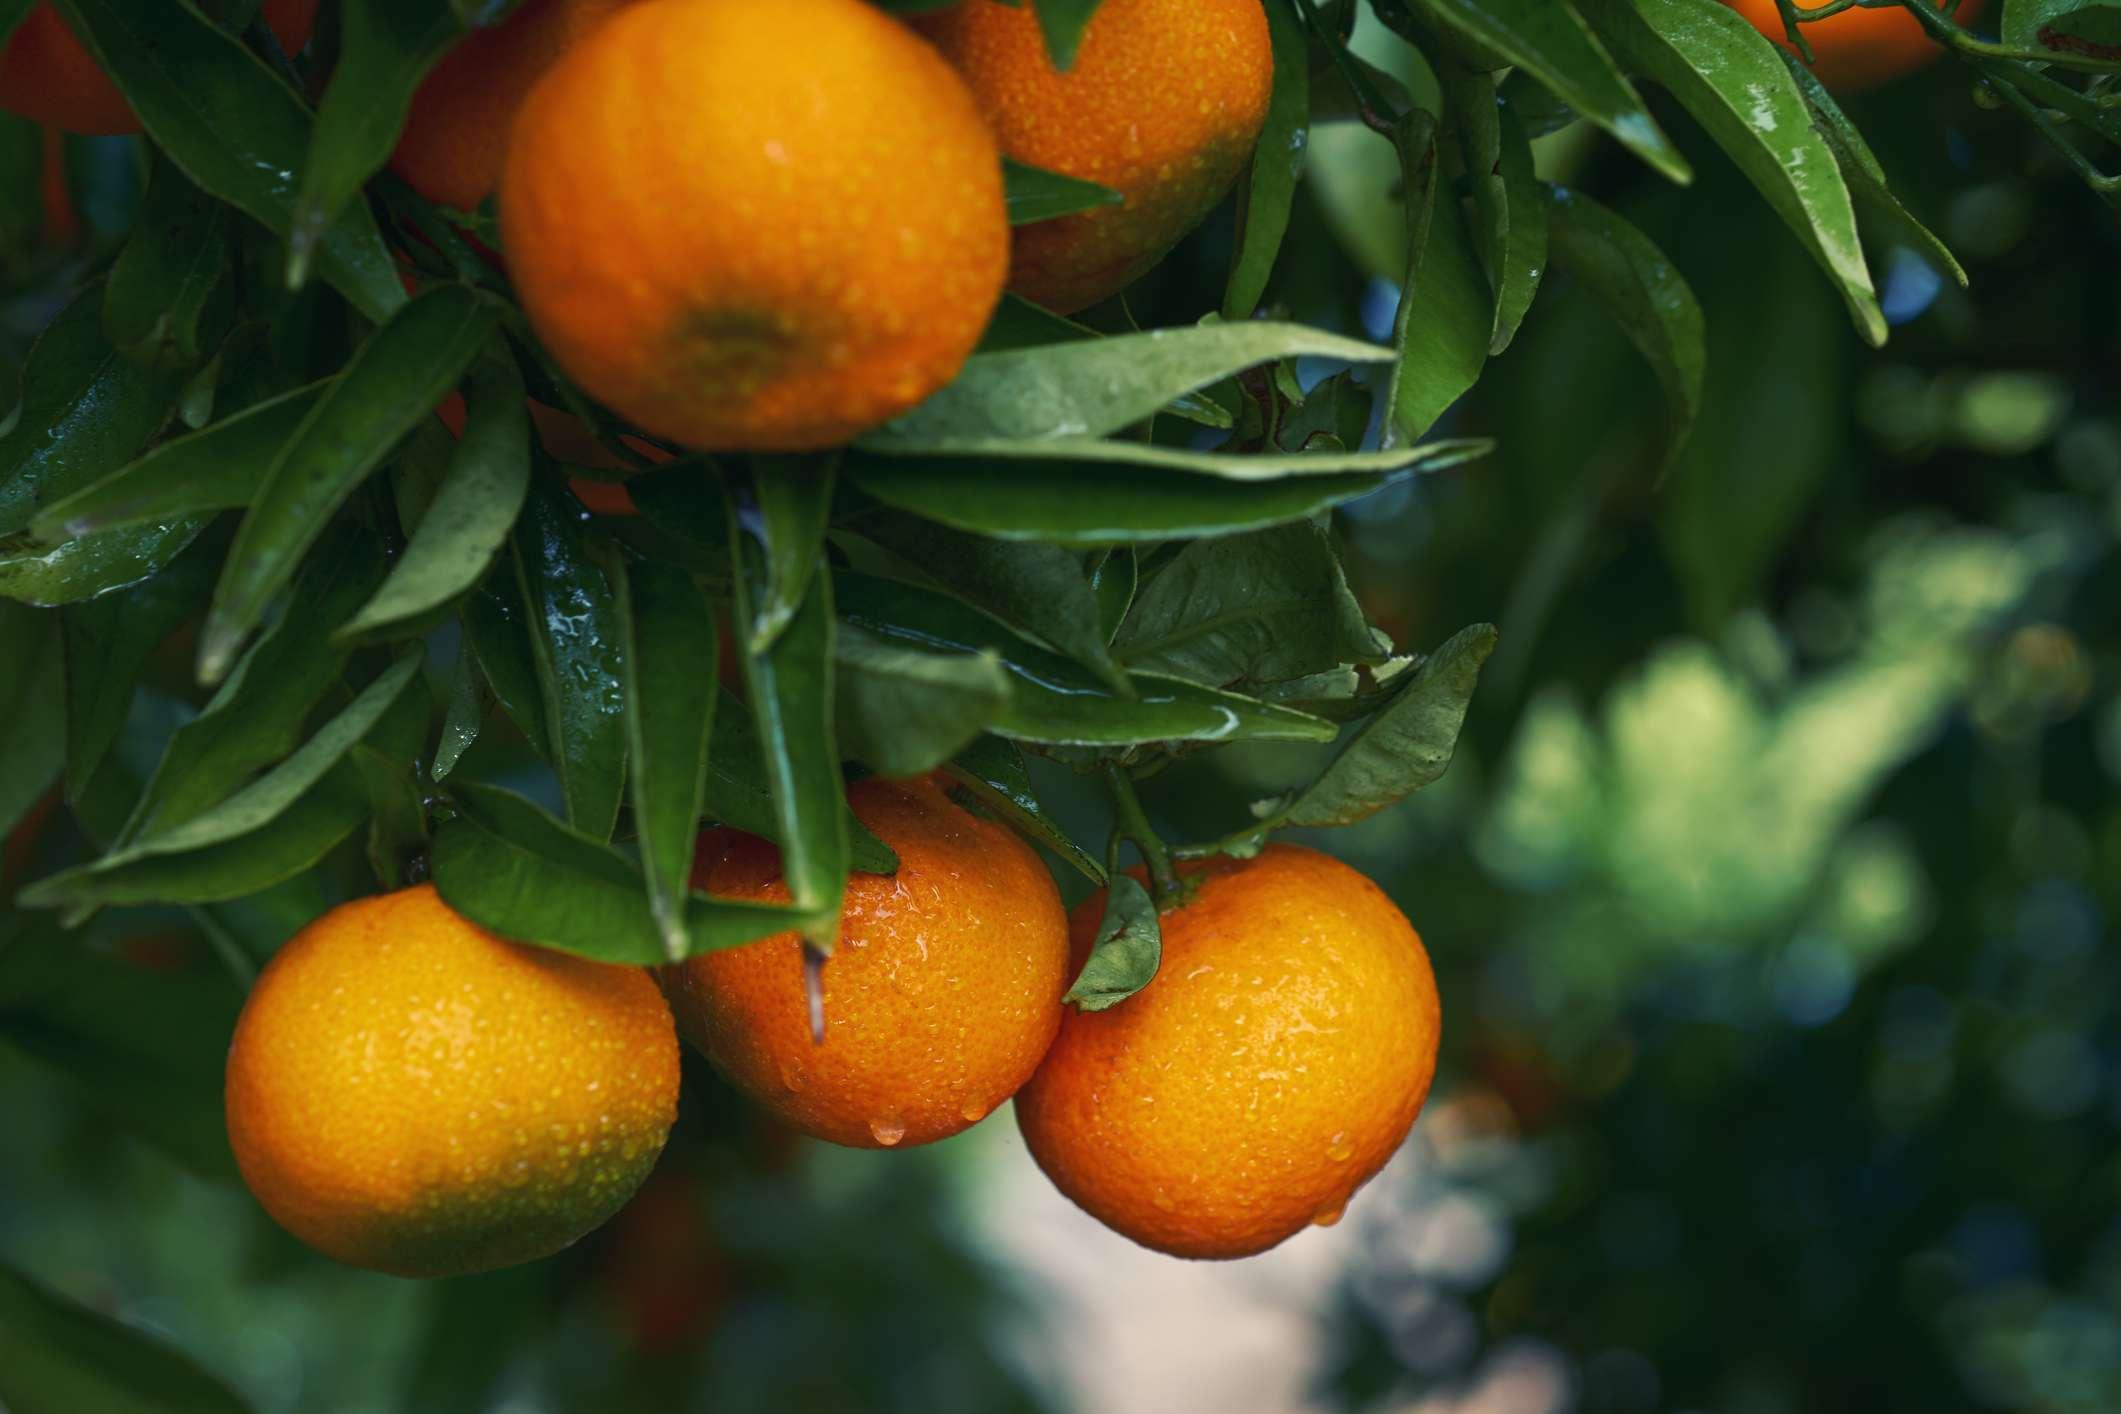 Ganz und zu Extrem Common Citrus Fruits and Where They Grow #EZ_14